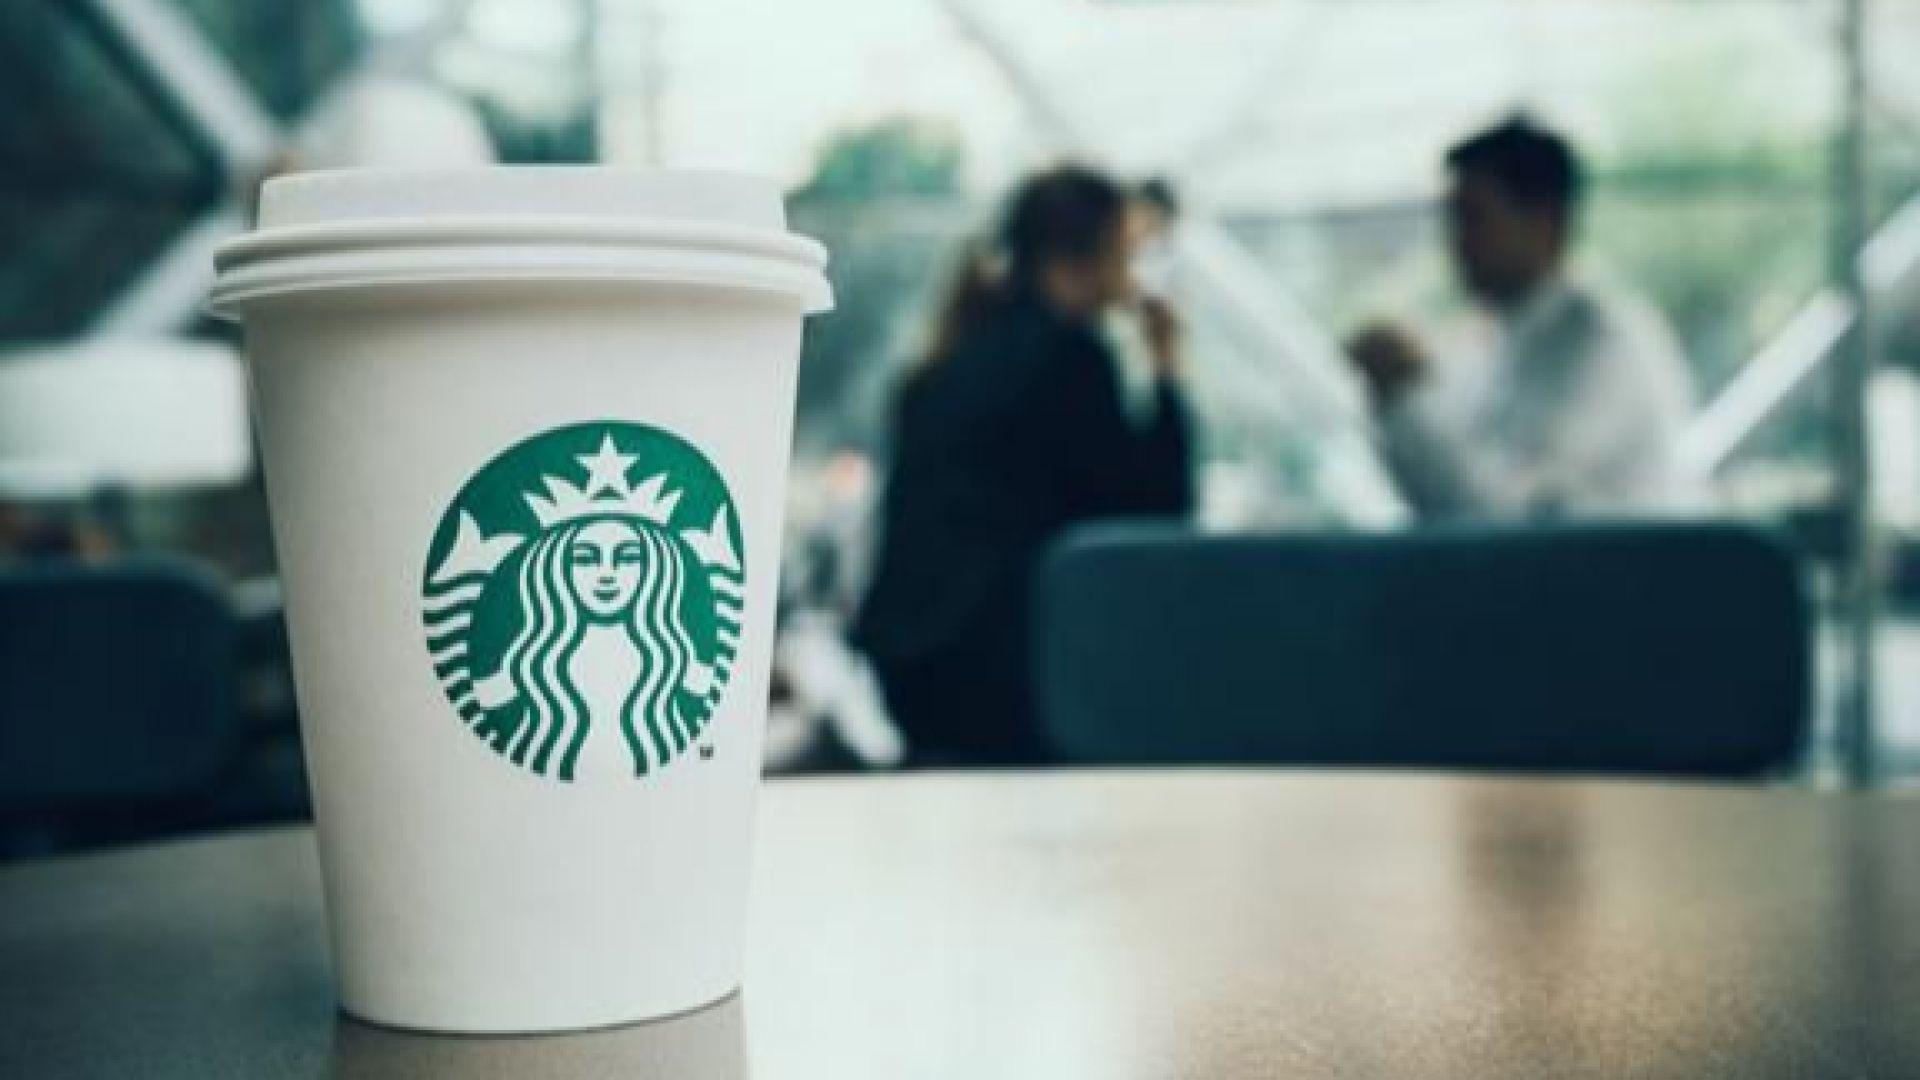 Nestle купи за $ 7 милиарда правото да продава кафе Starbucks